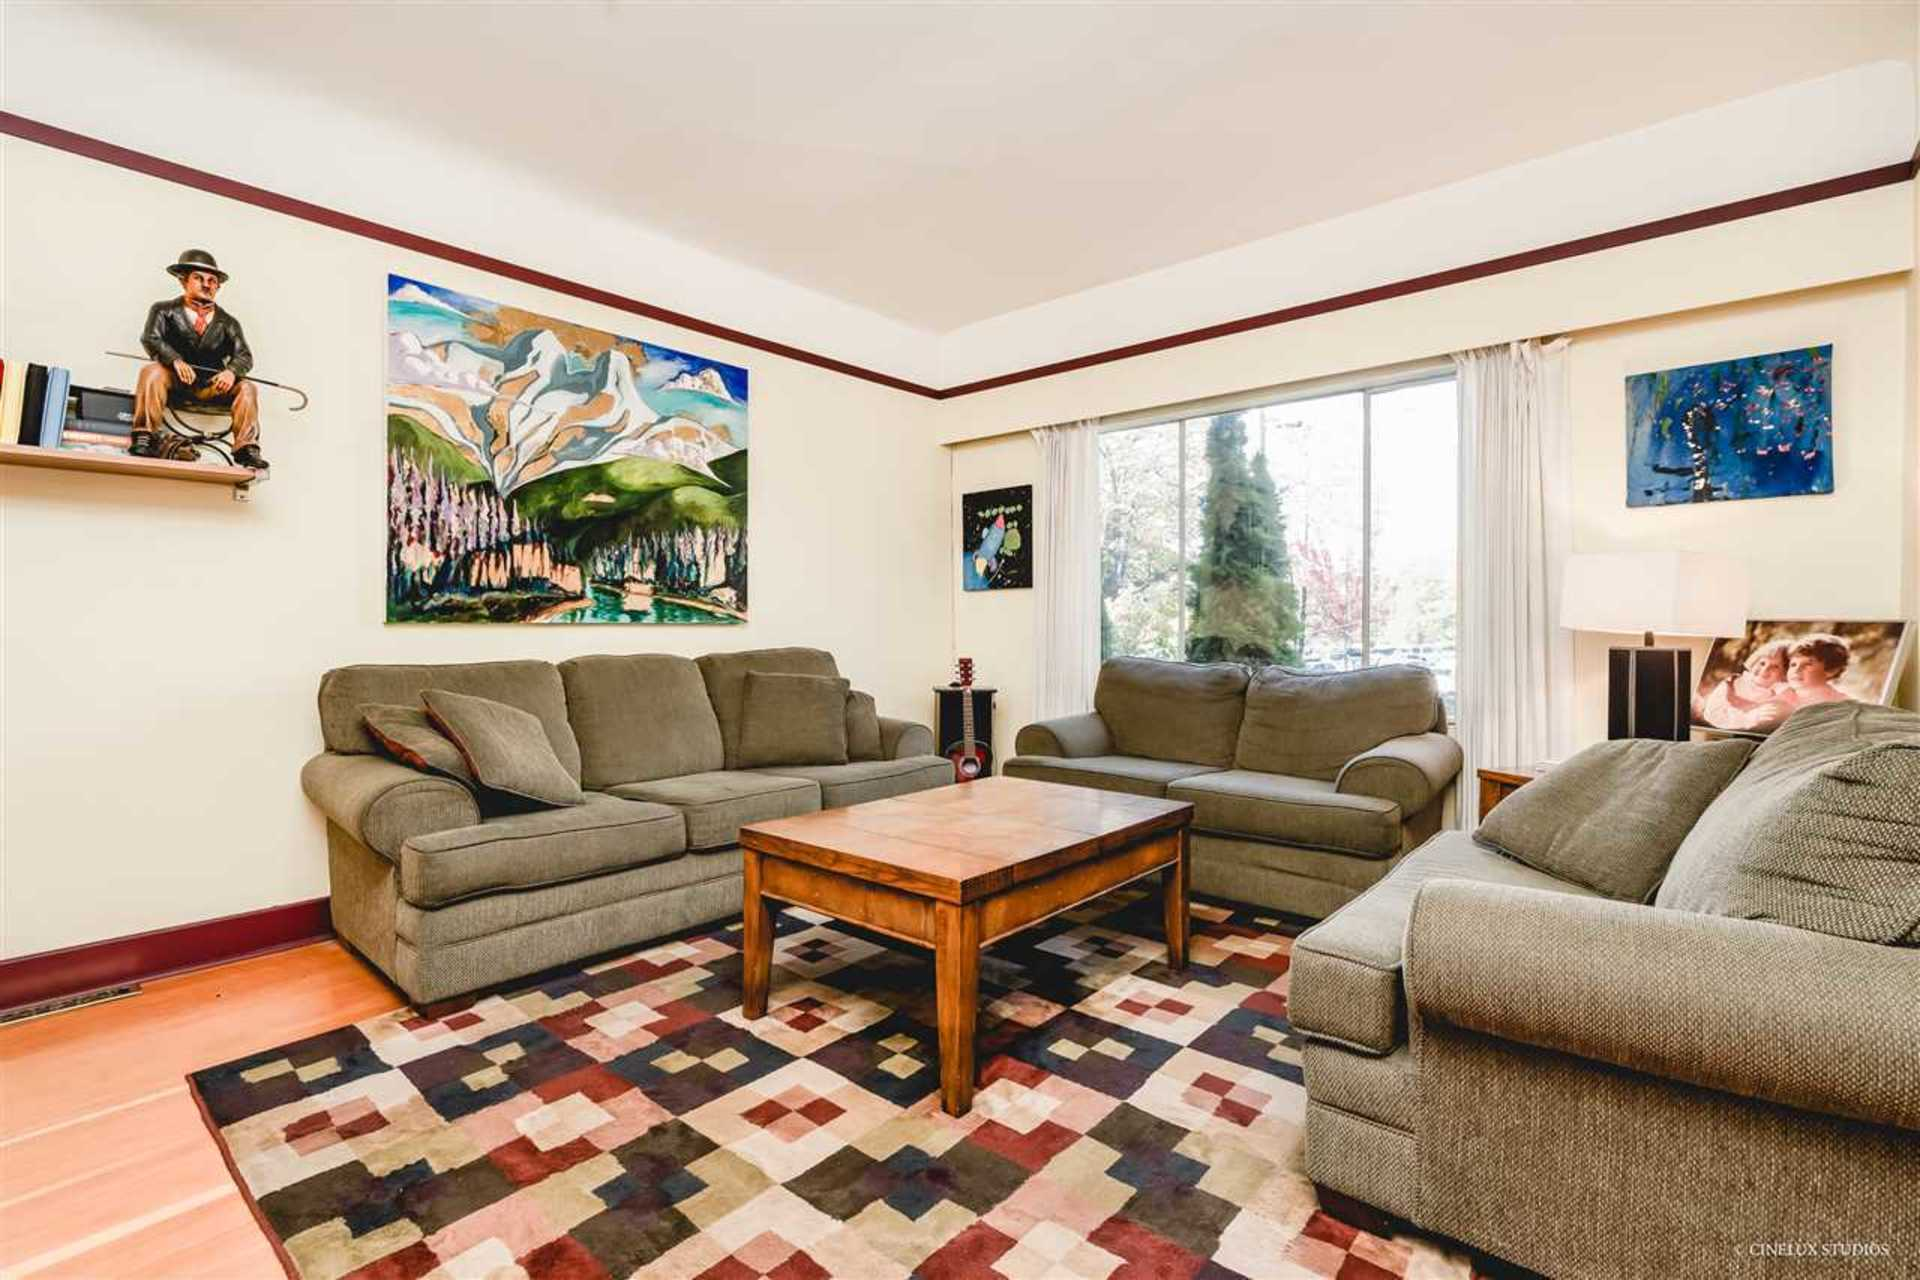 1824-e-10th-avenue-grandview-ve-vancouver-east-03 at 1824 E 10th Avenue, Grandview VE, Vancouver East